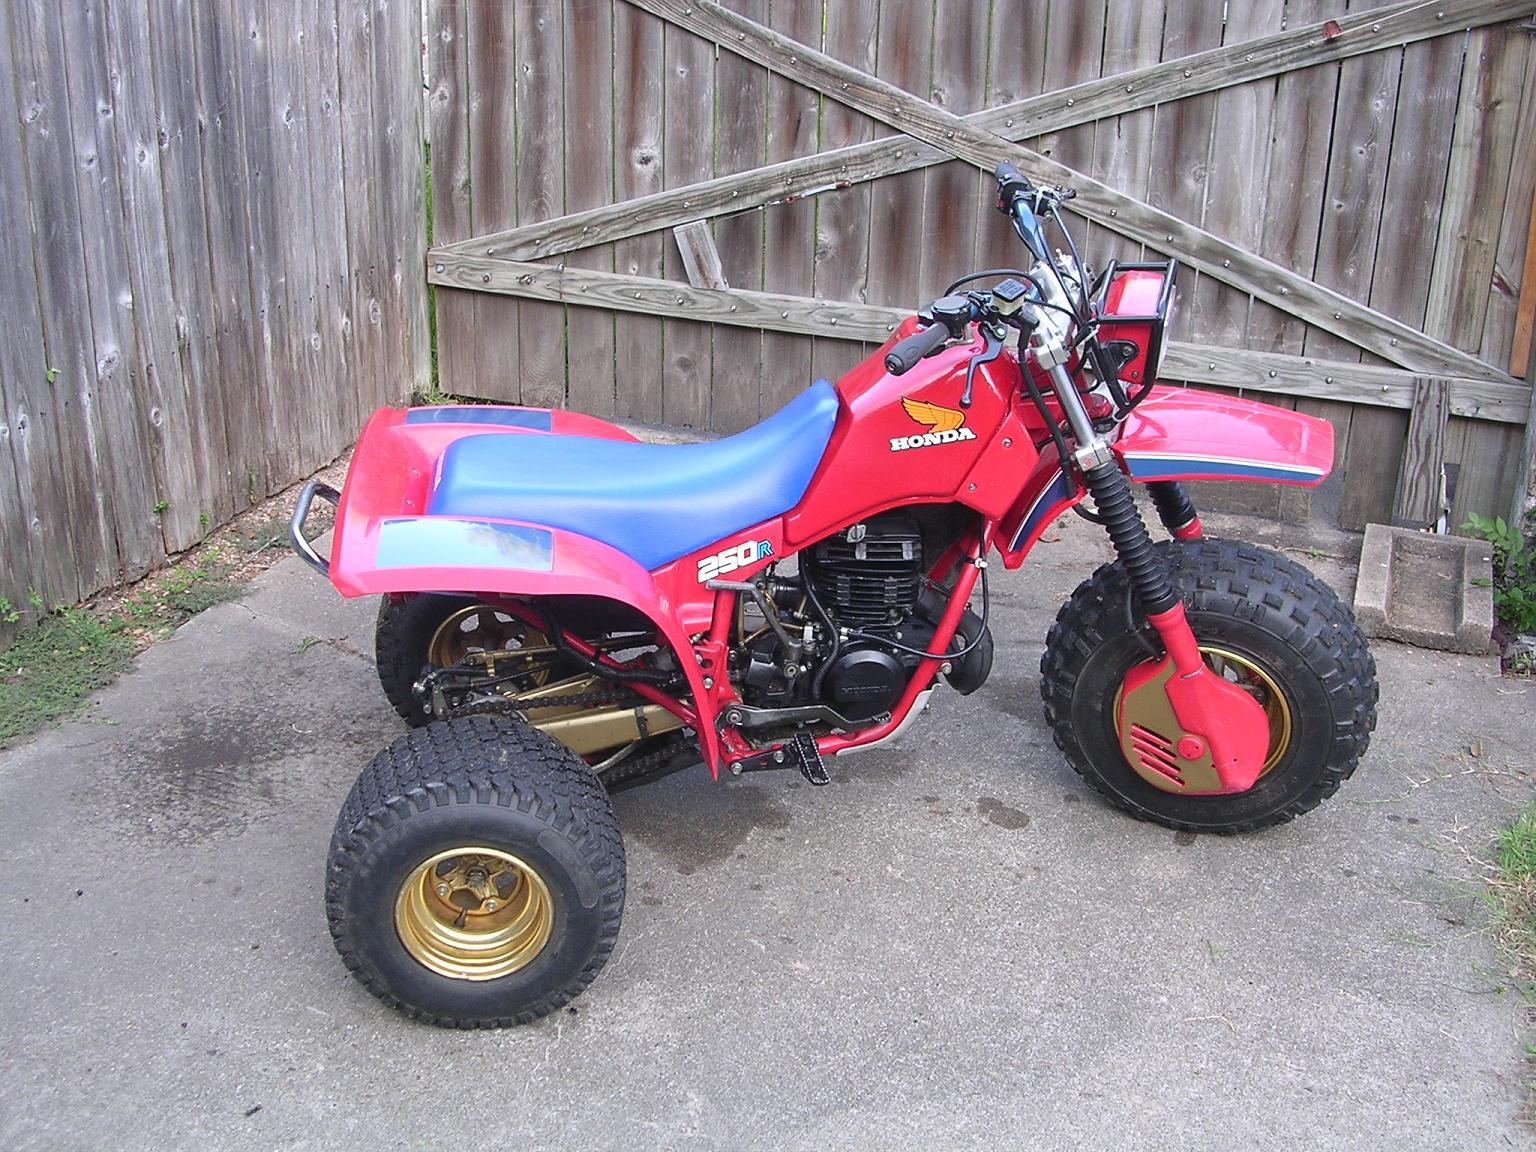 Honda big red 3 wheeler for sale craigslist